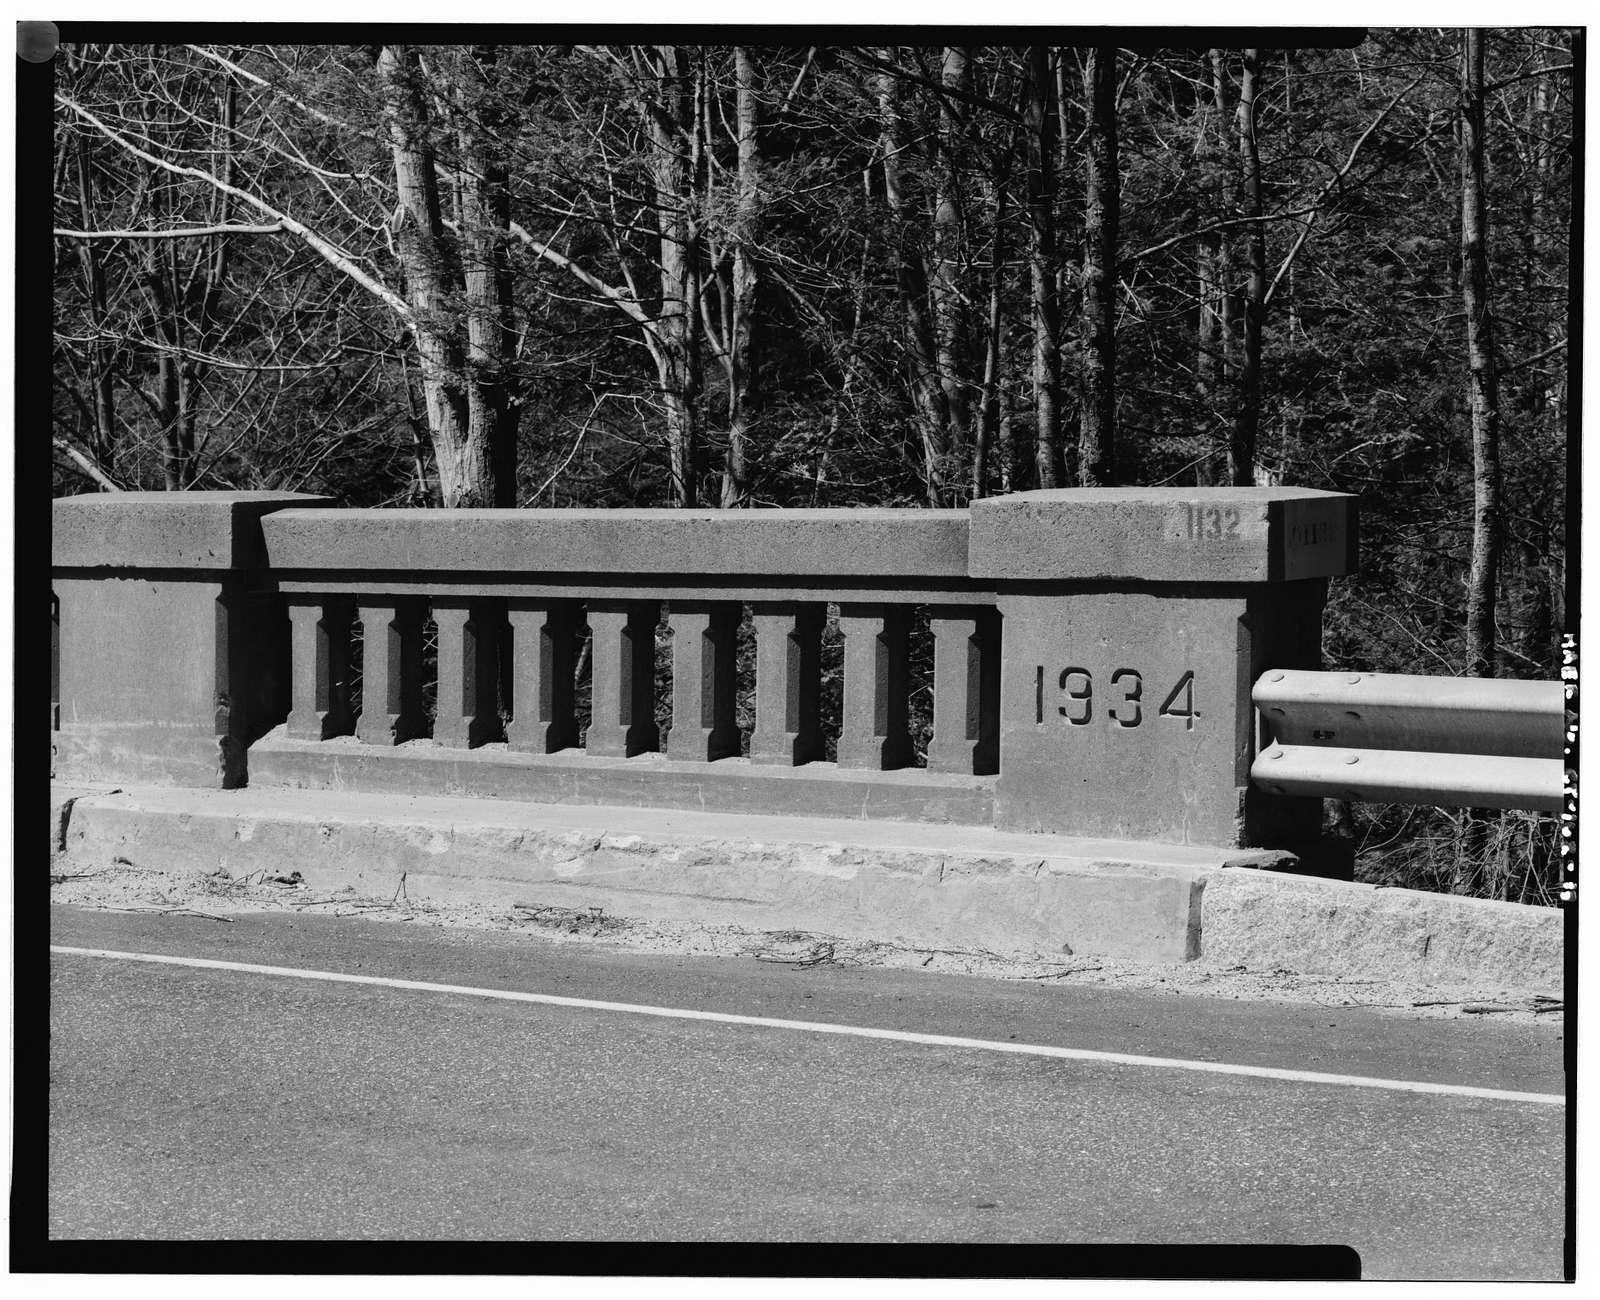 Bridge No. 1132, Route 80, spanning Hammonasset River, Madison, New Haven County, CT